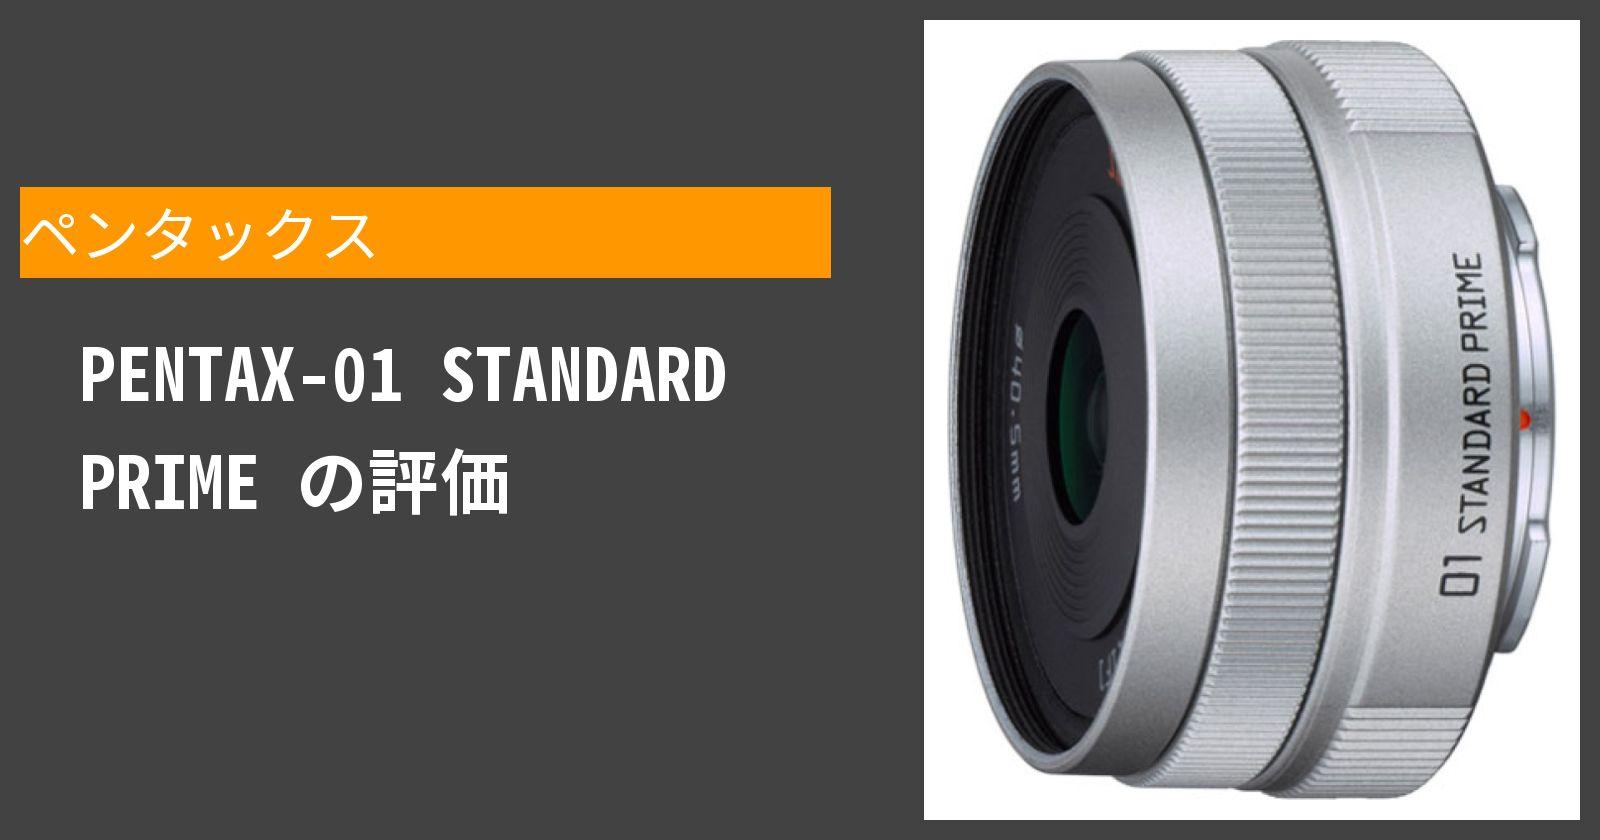 PENTAX-01 STANDARD PRIMEを徹底評価